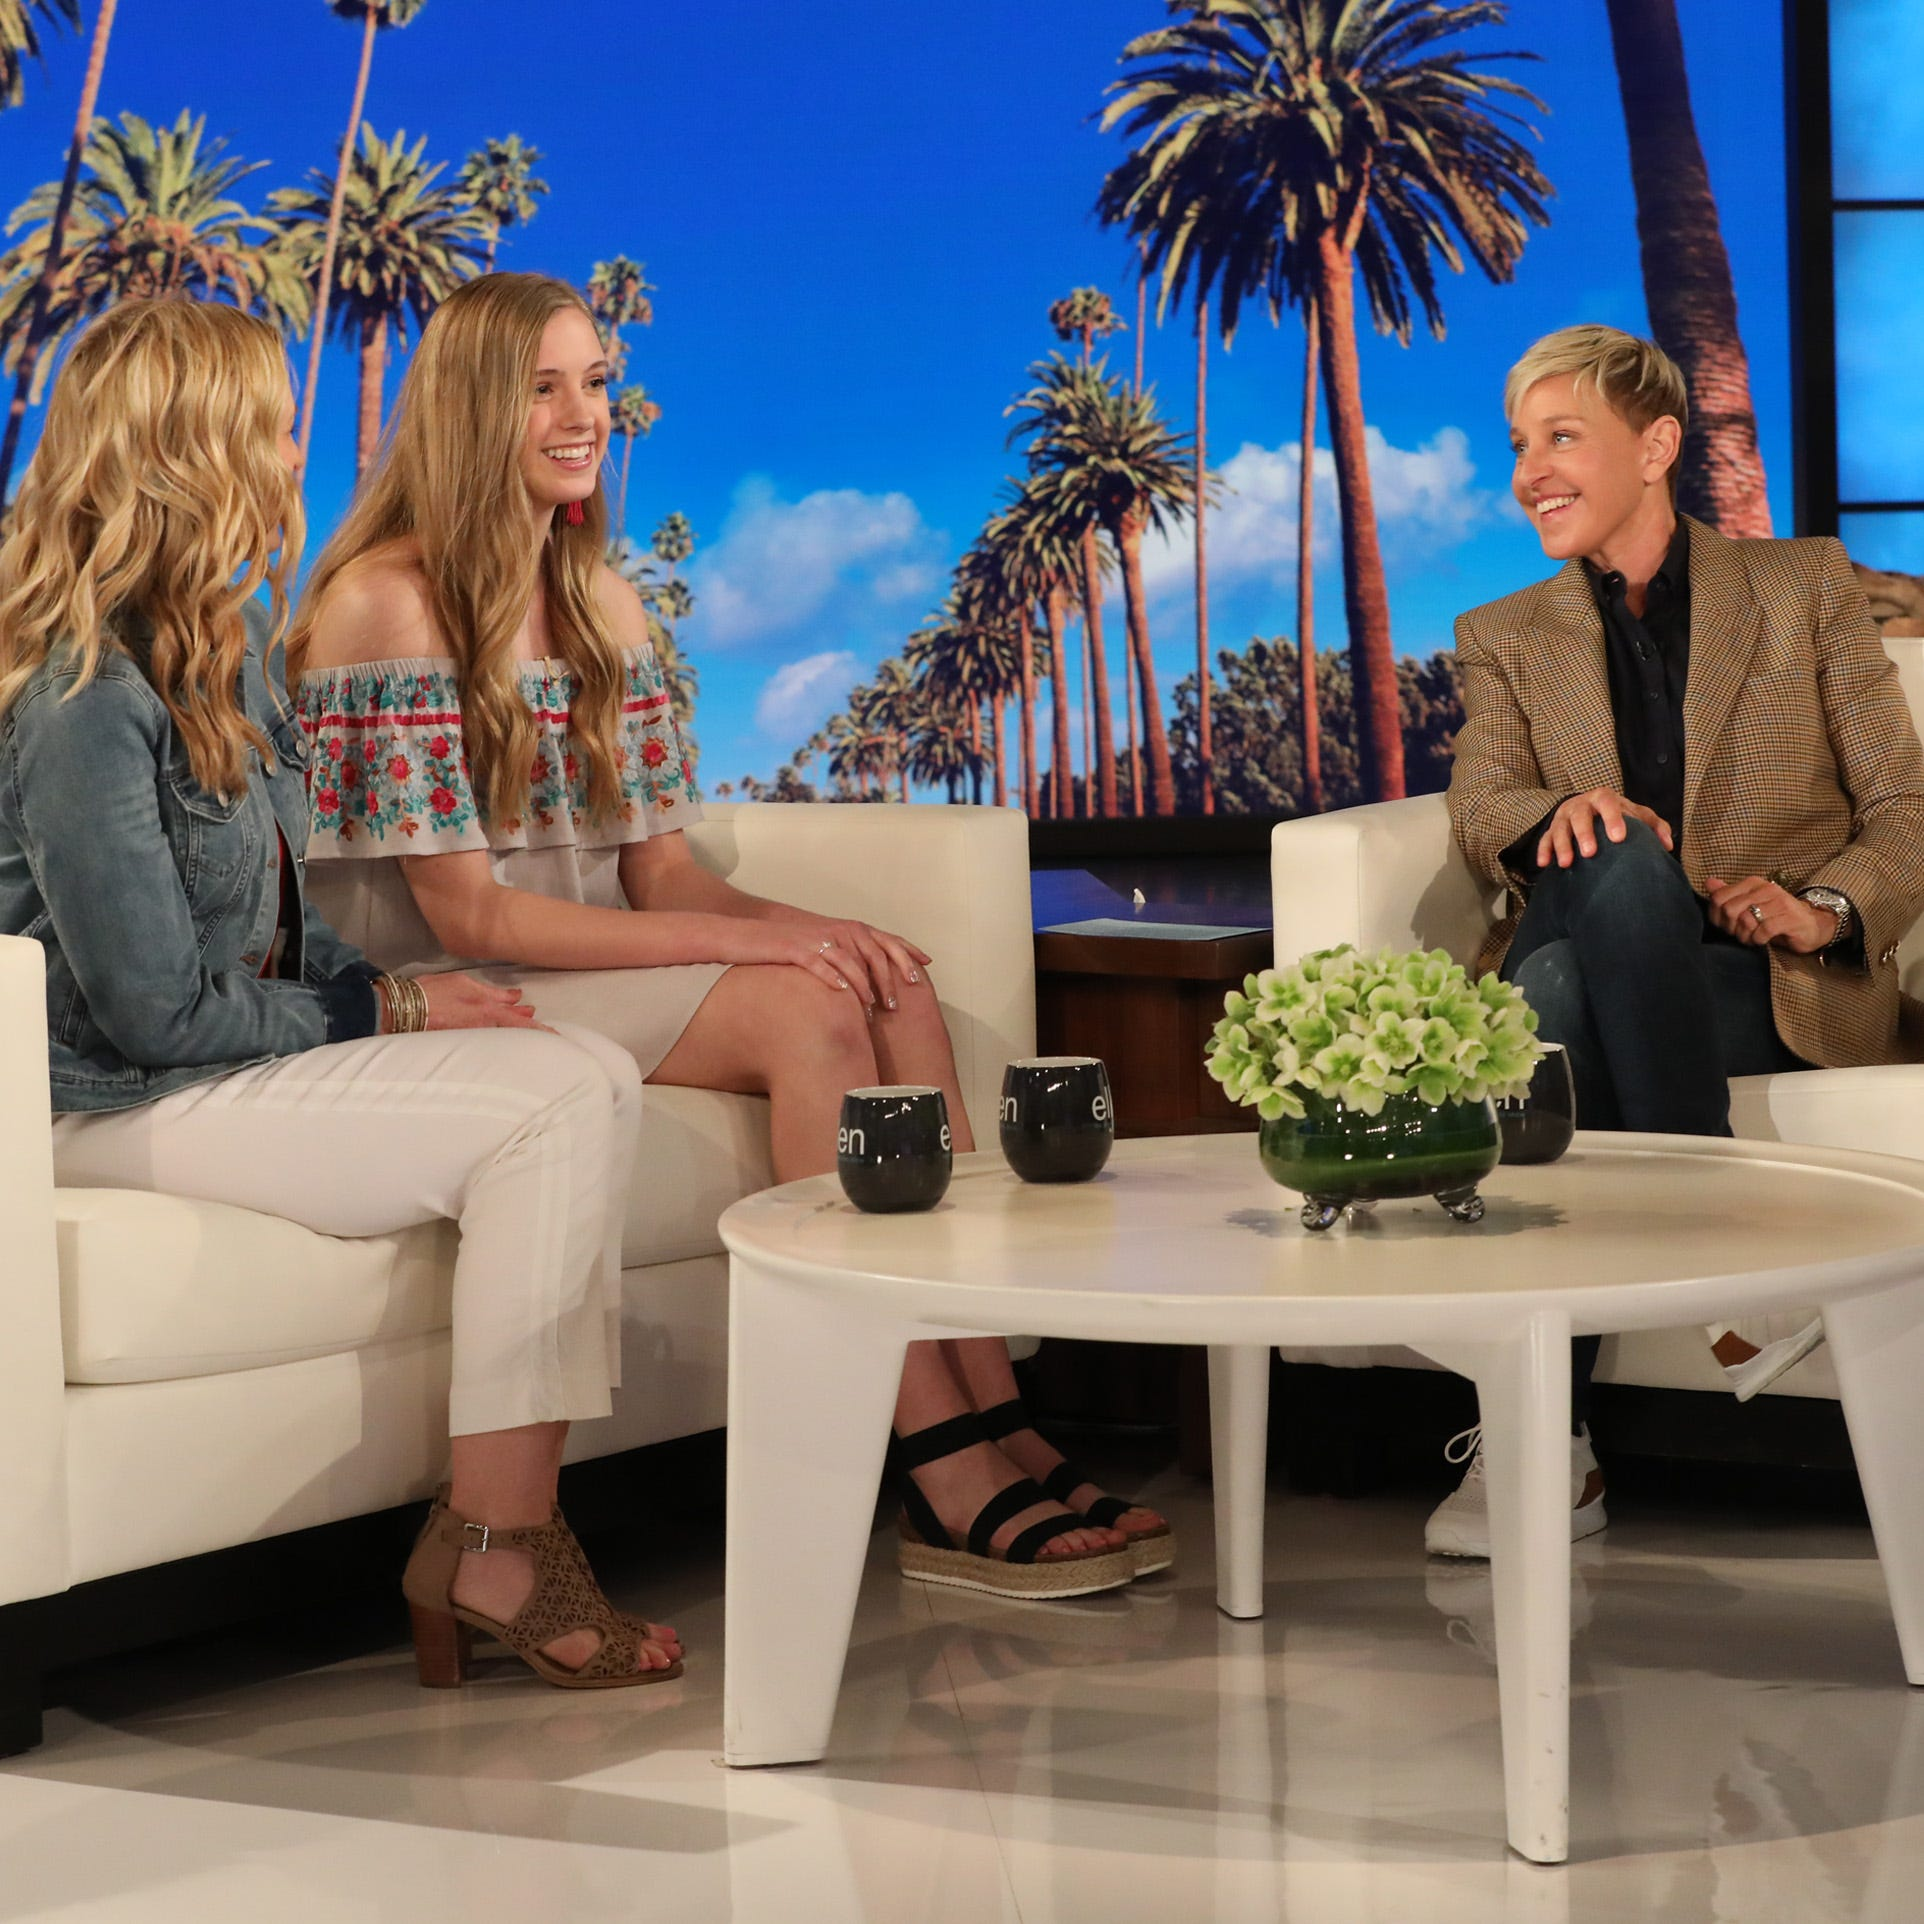 Marshfield teen to appear on Ellen DeGeneres show after post-surgery video reaches host